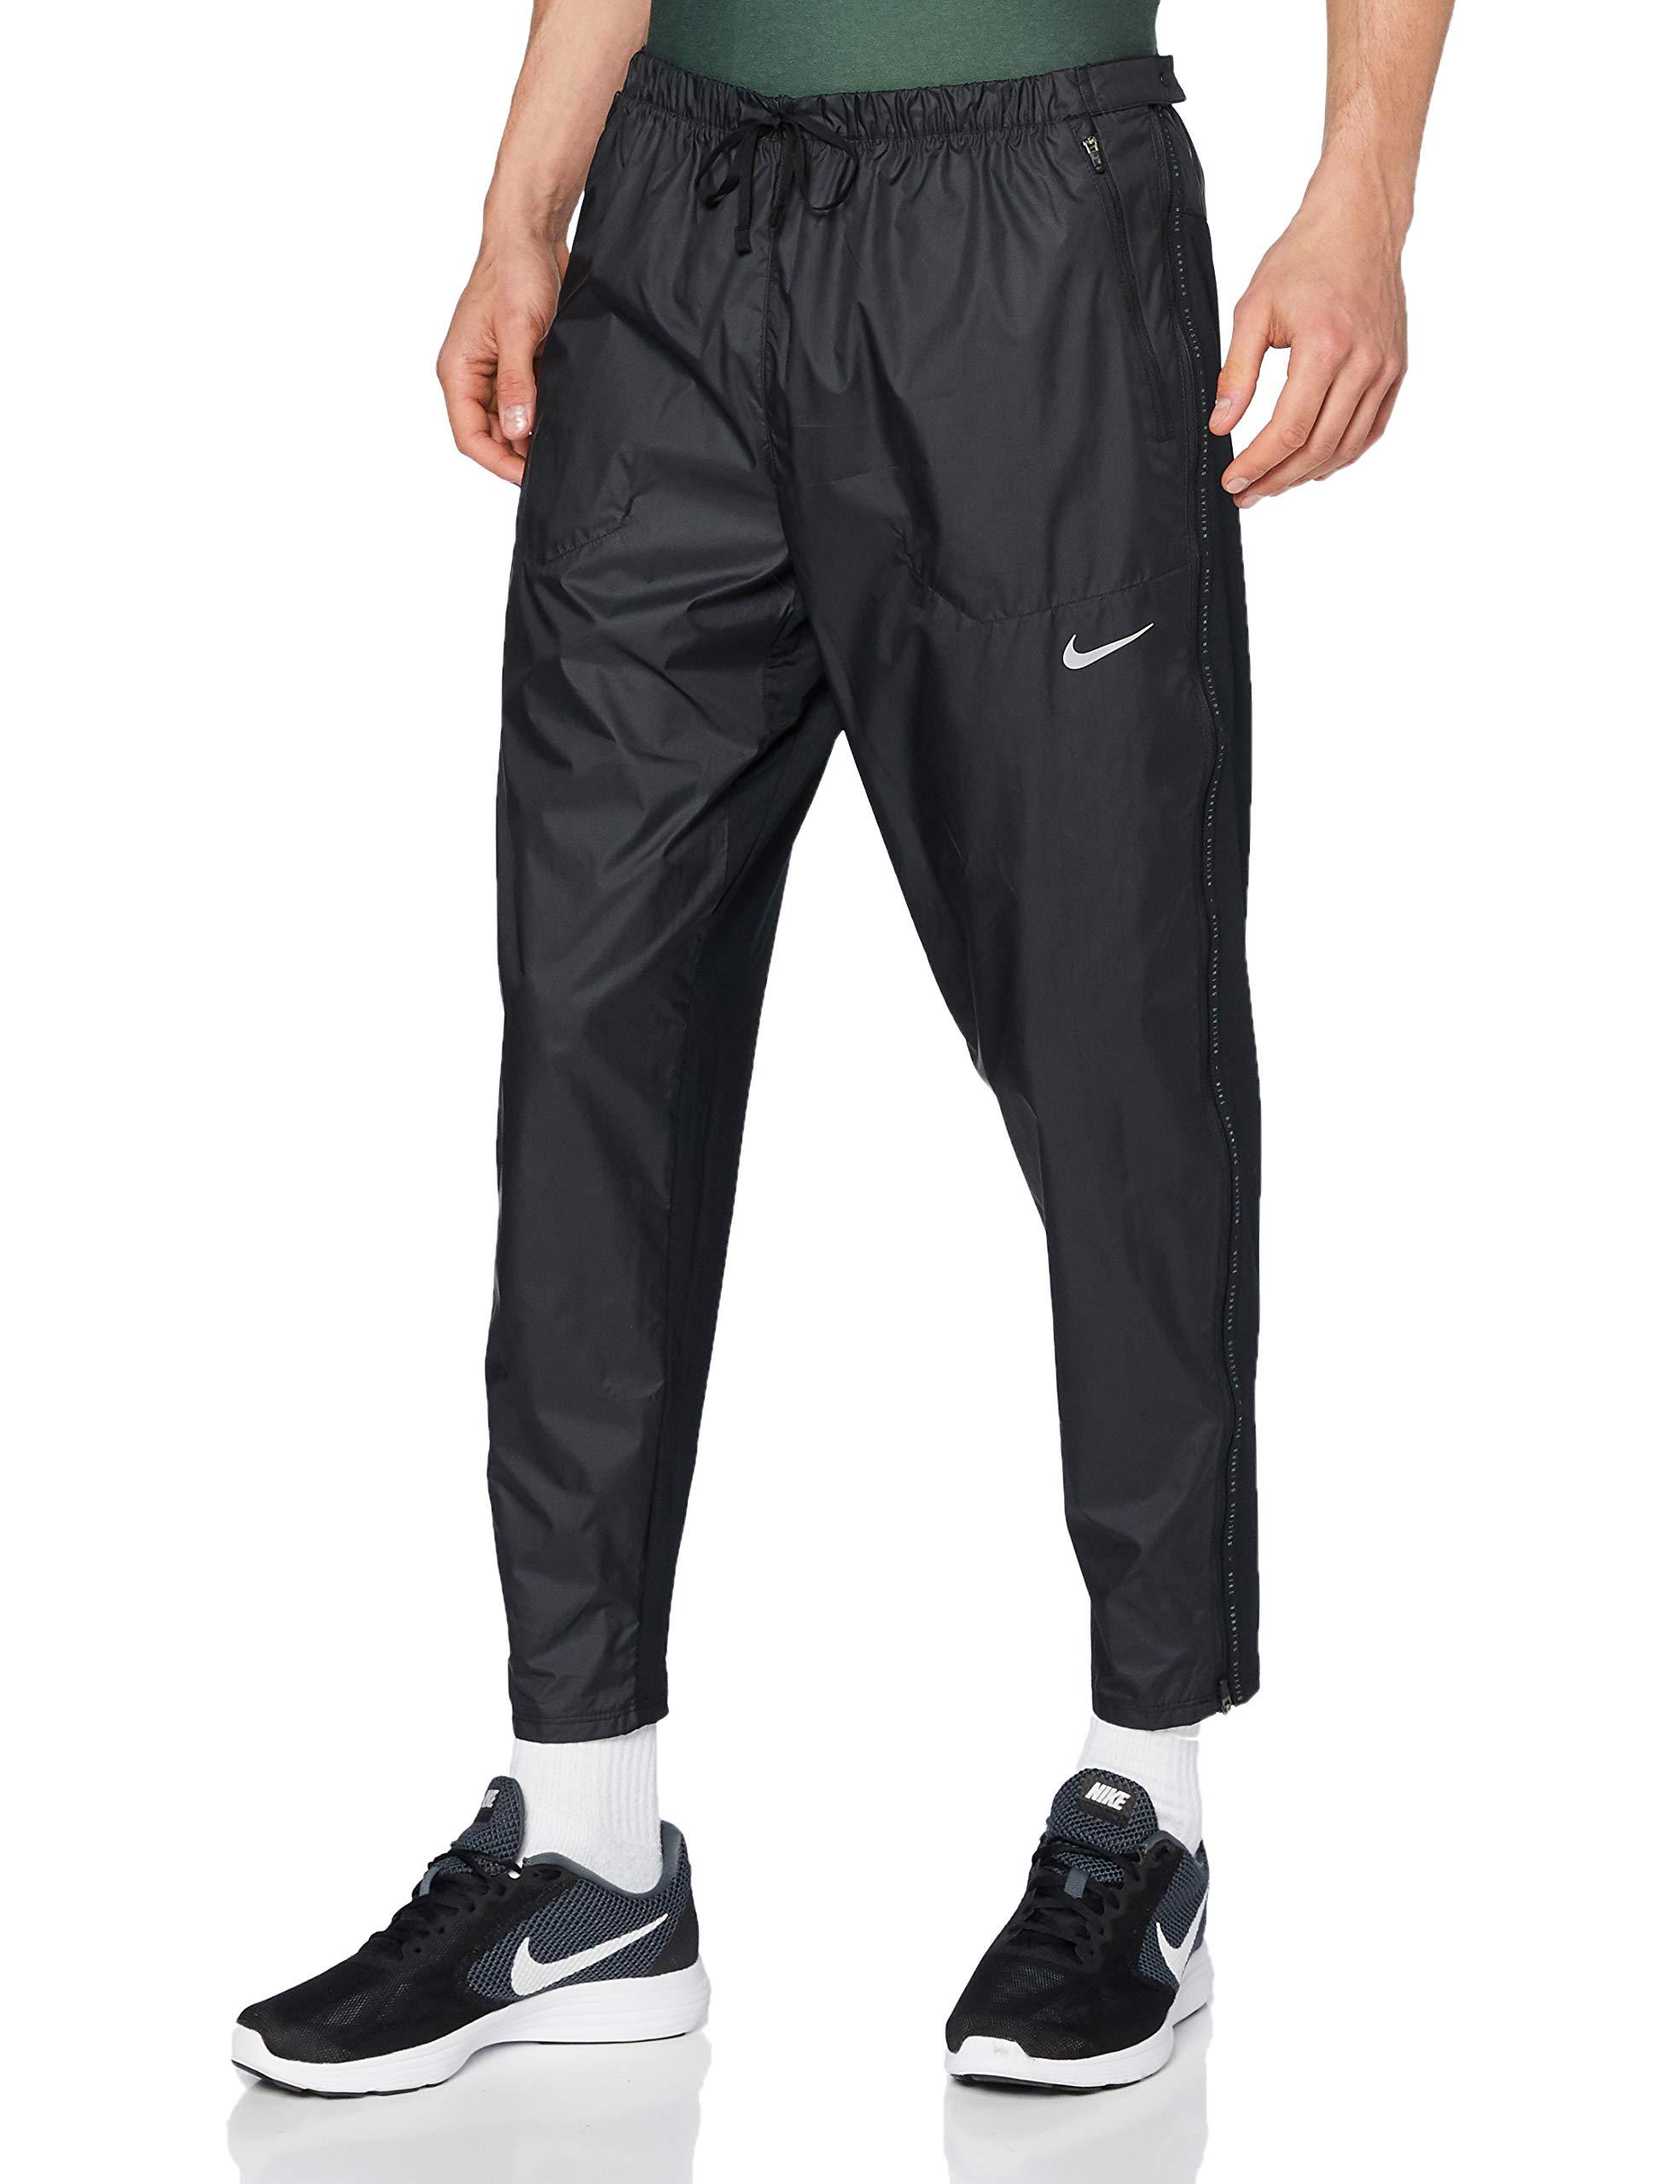 Nike Herren Rn Dvn Phnm Elite Shild Sporthose, Black/Black/Reflective Silv, XL